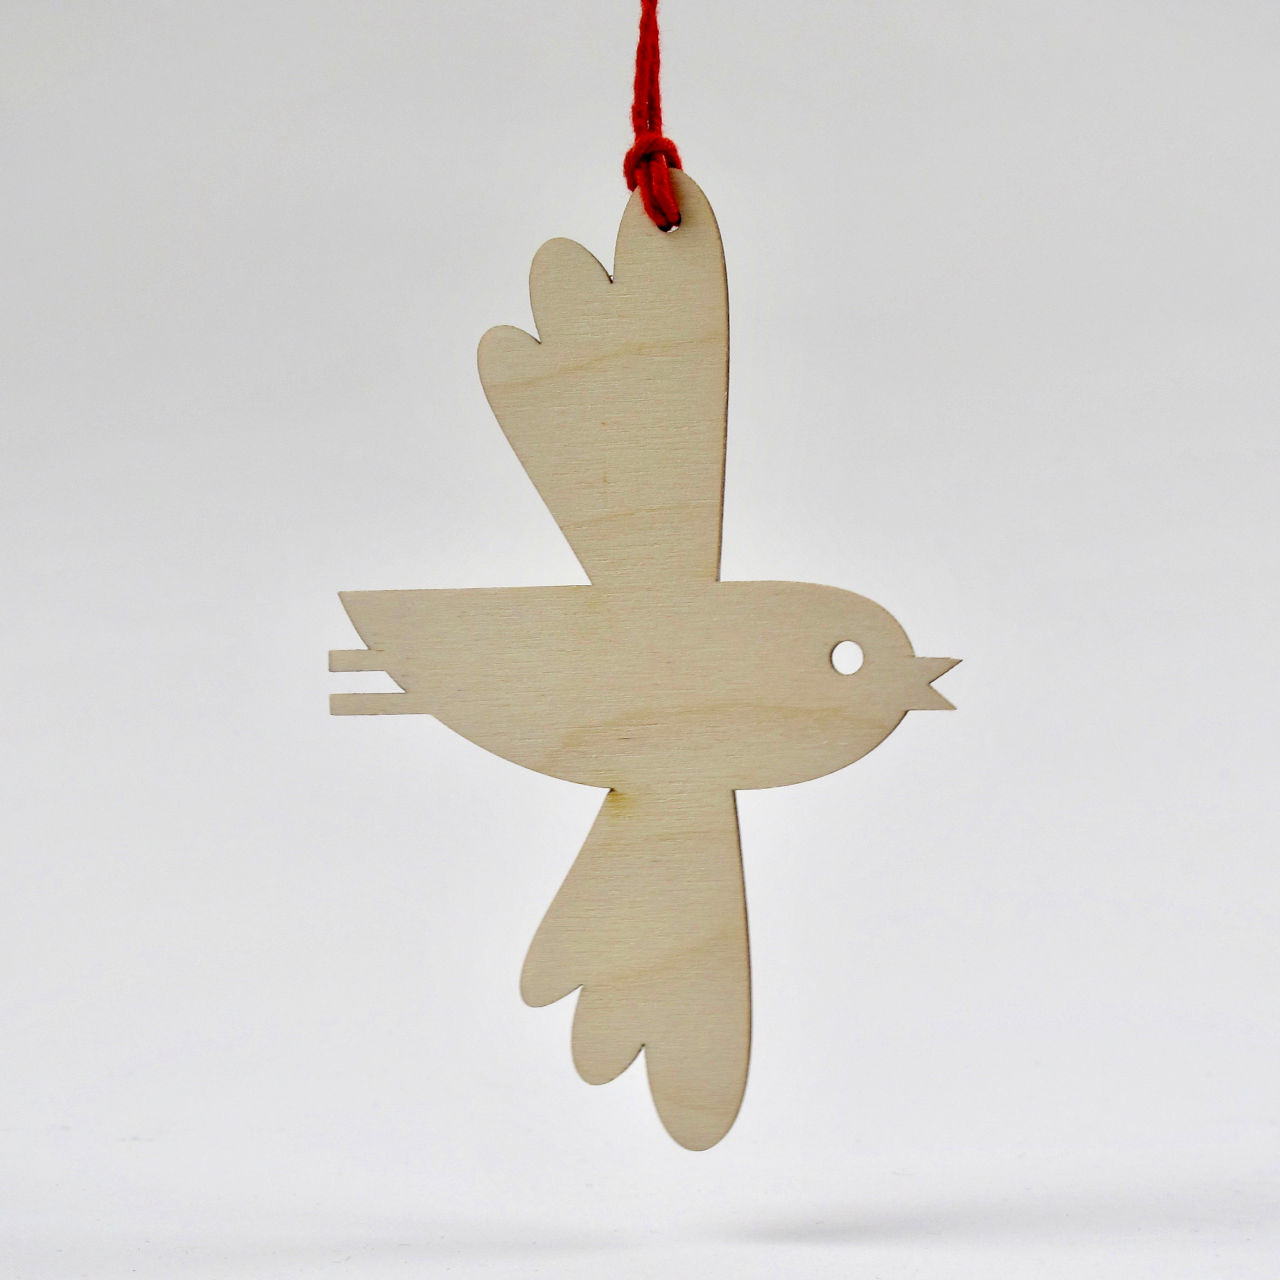 Plywood hanging dove decoration